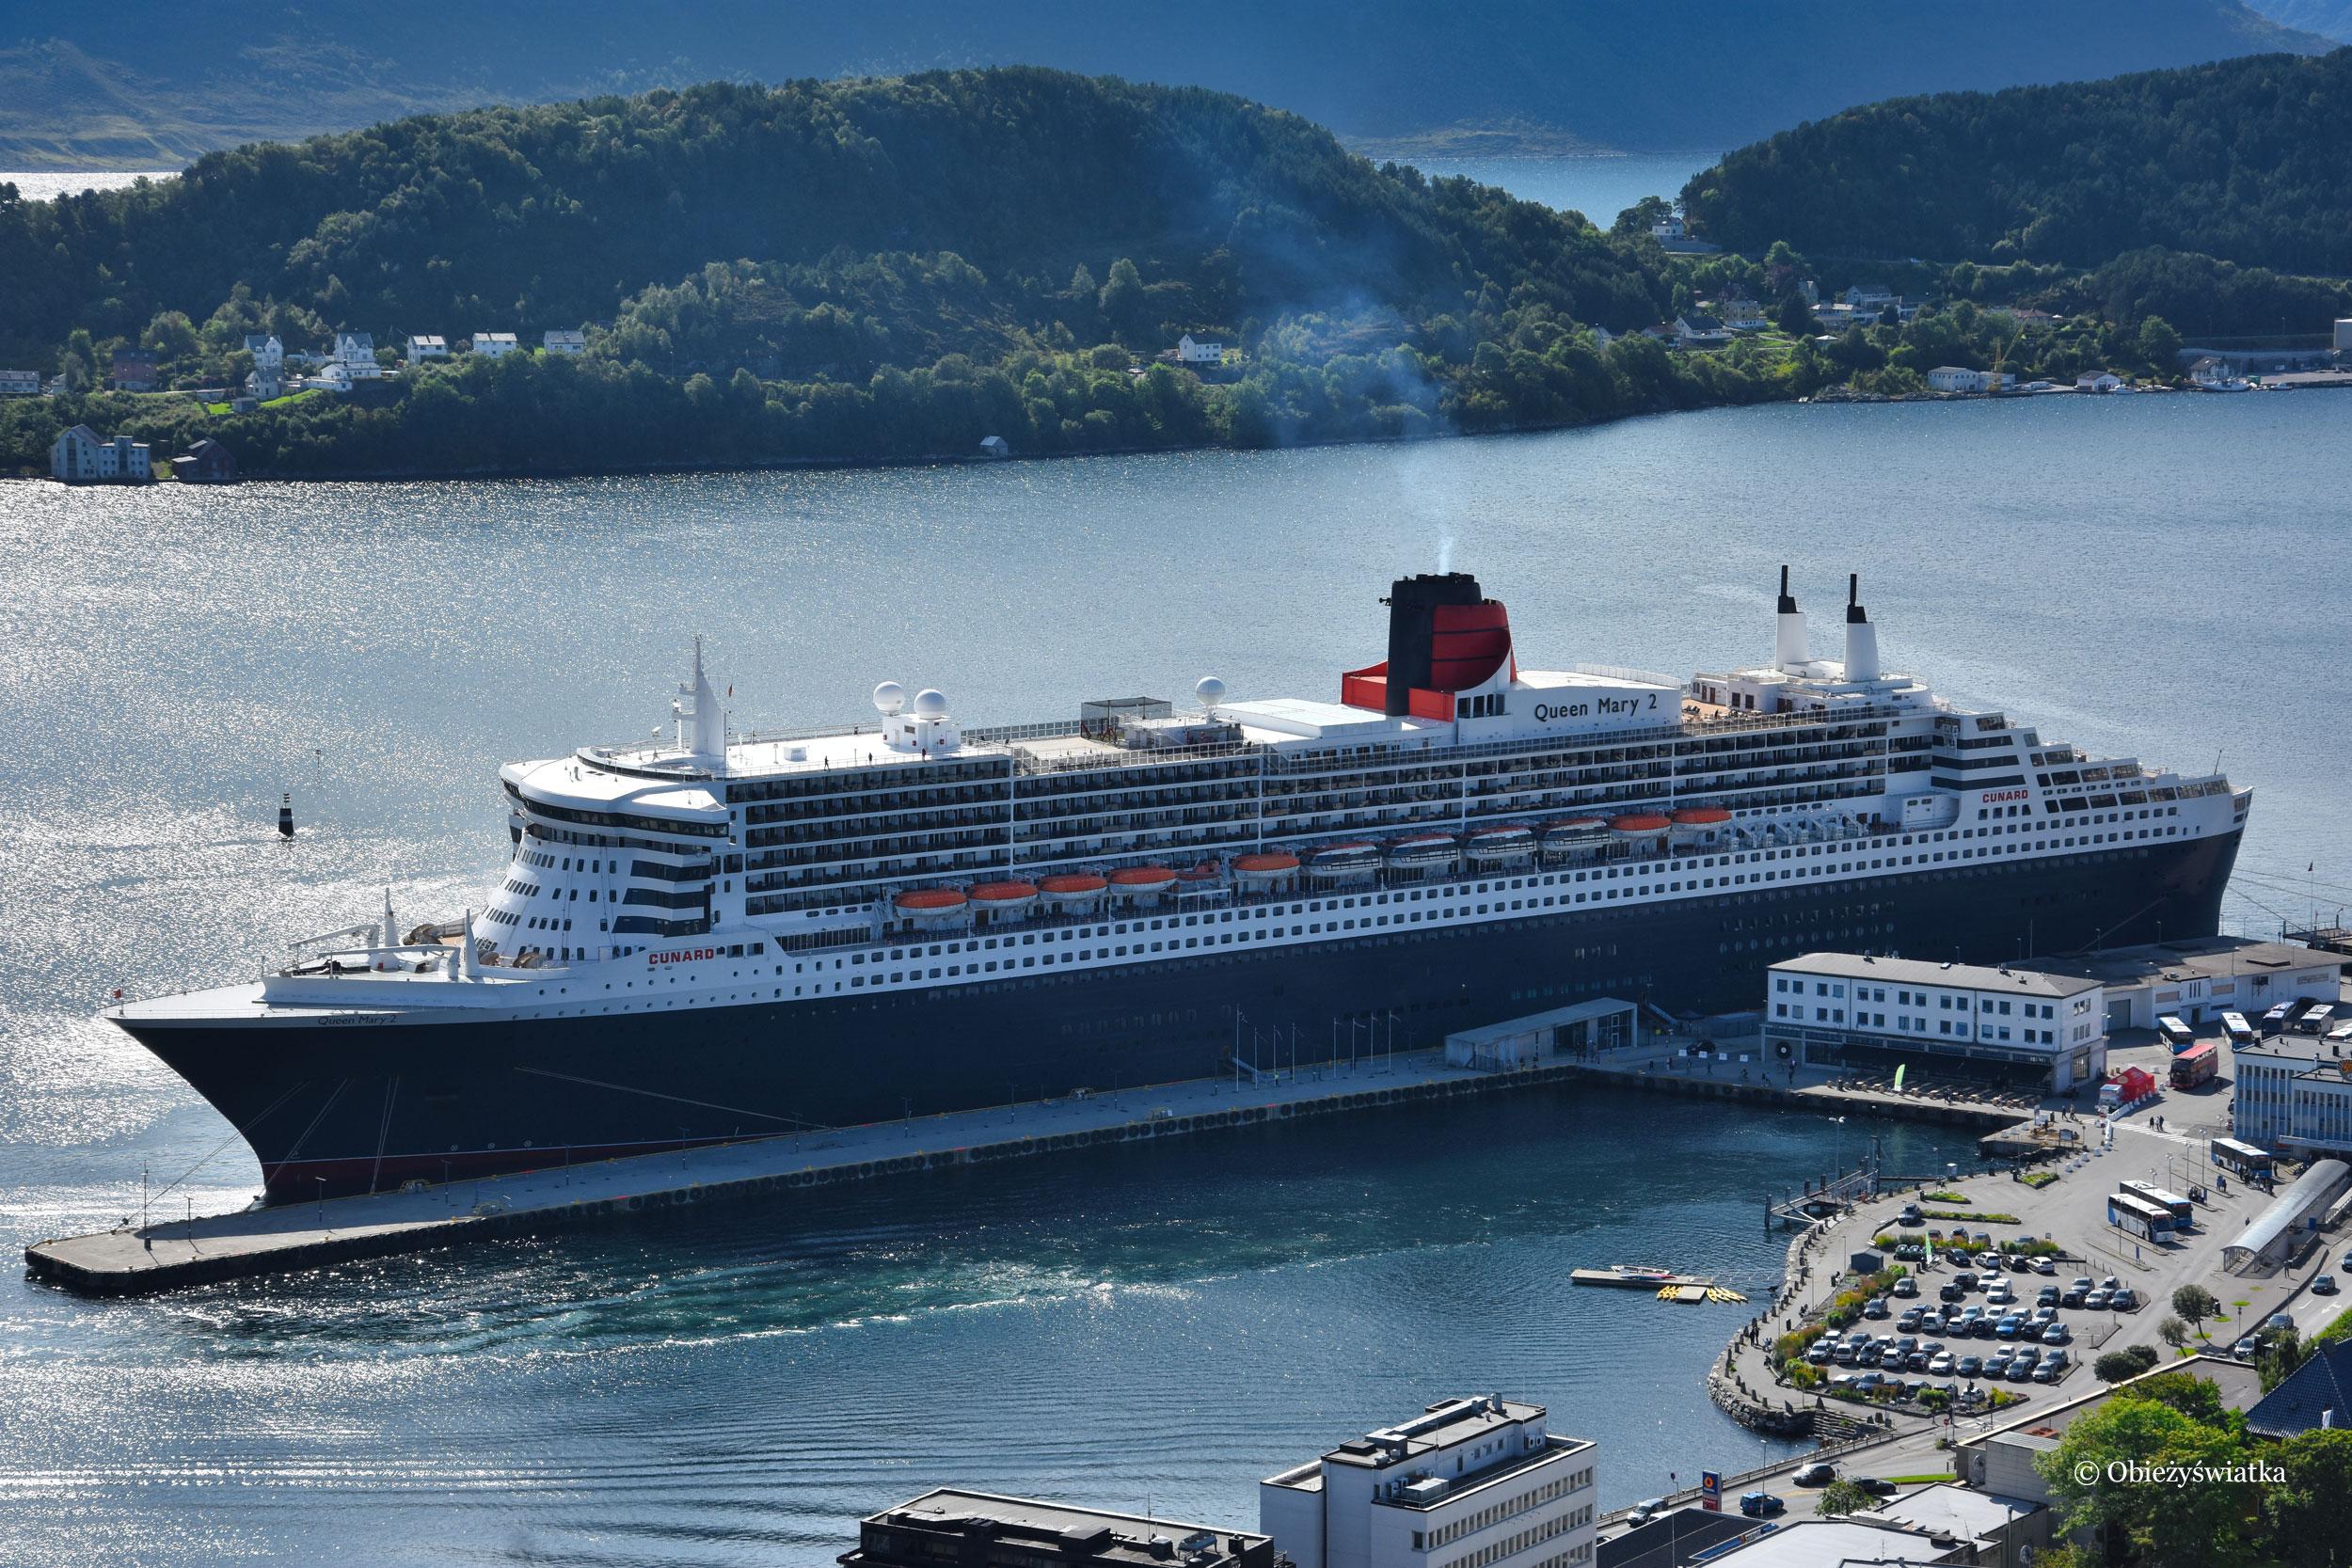 Queen Mary 2 w porcie Alesund, Norwegia 2017